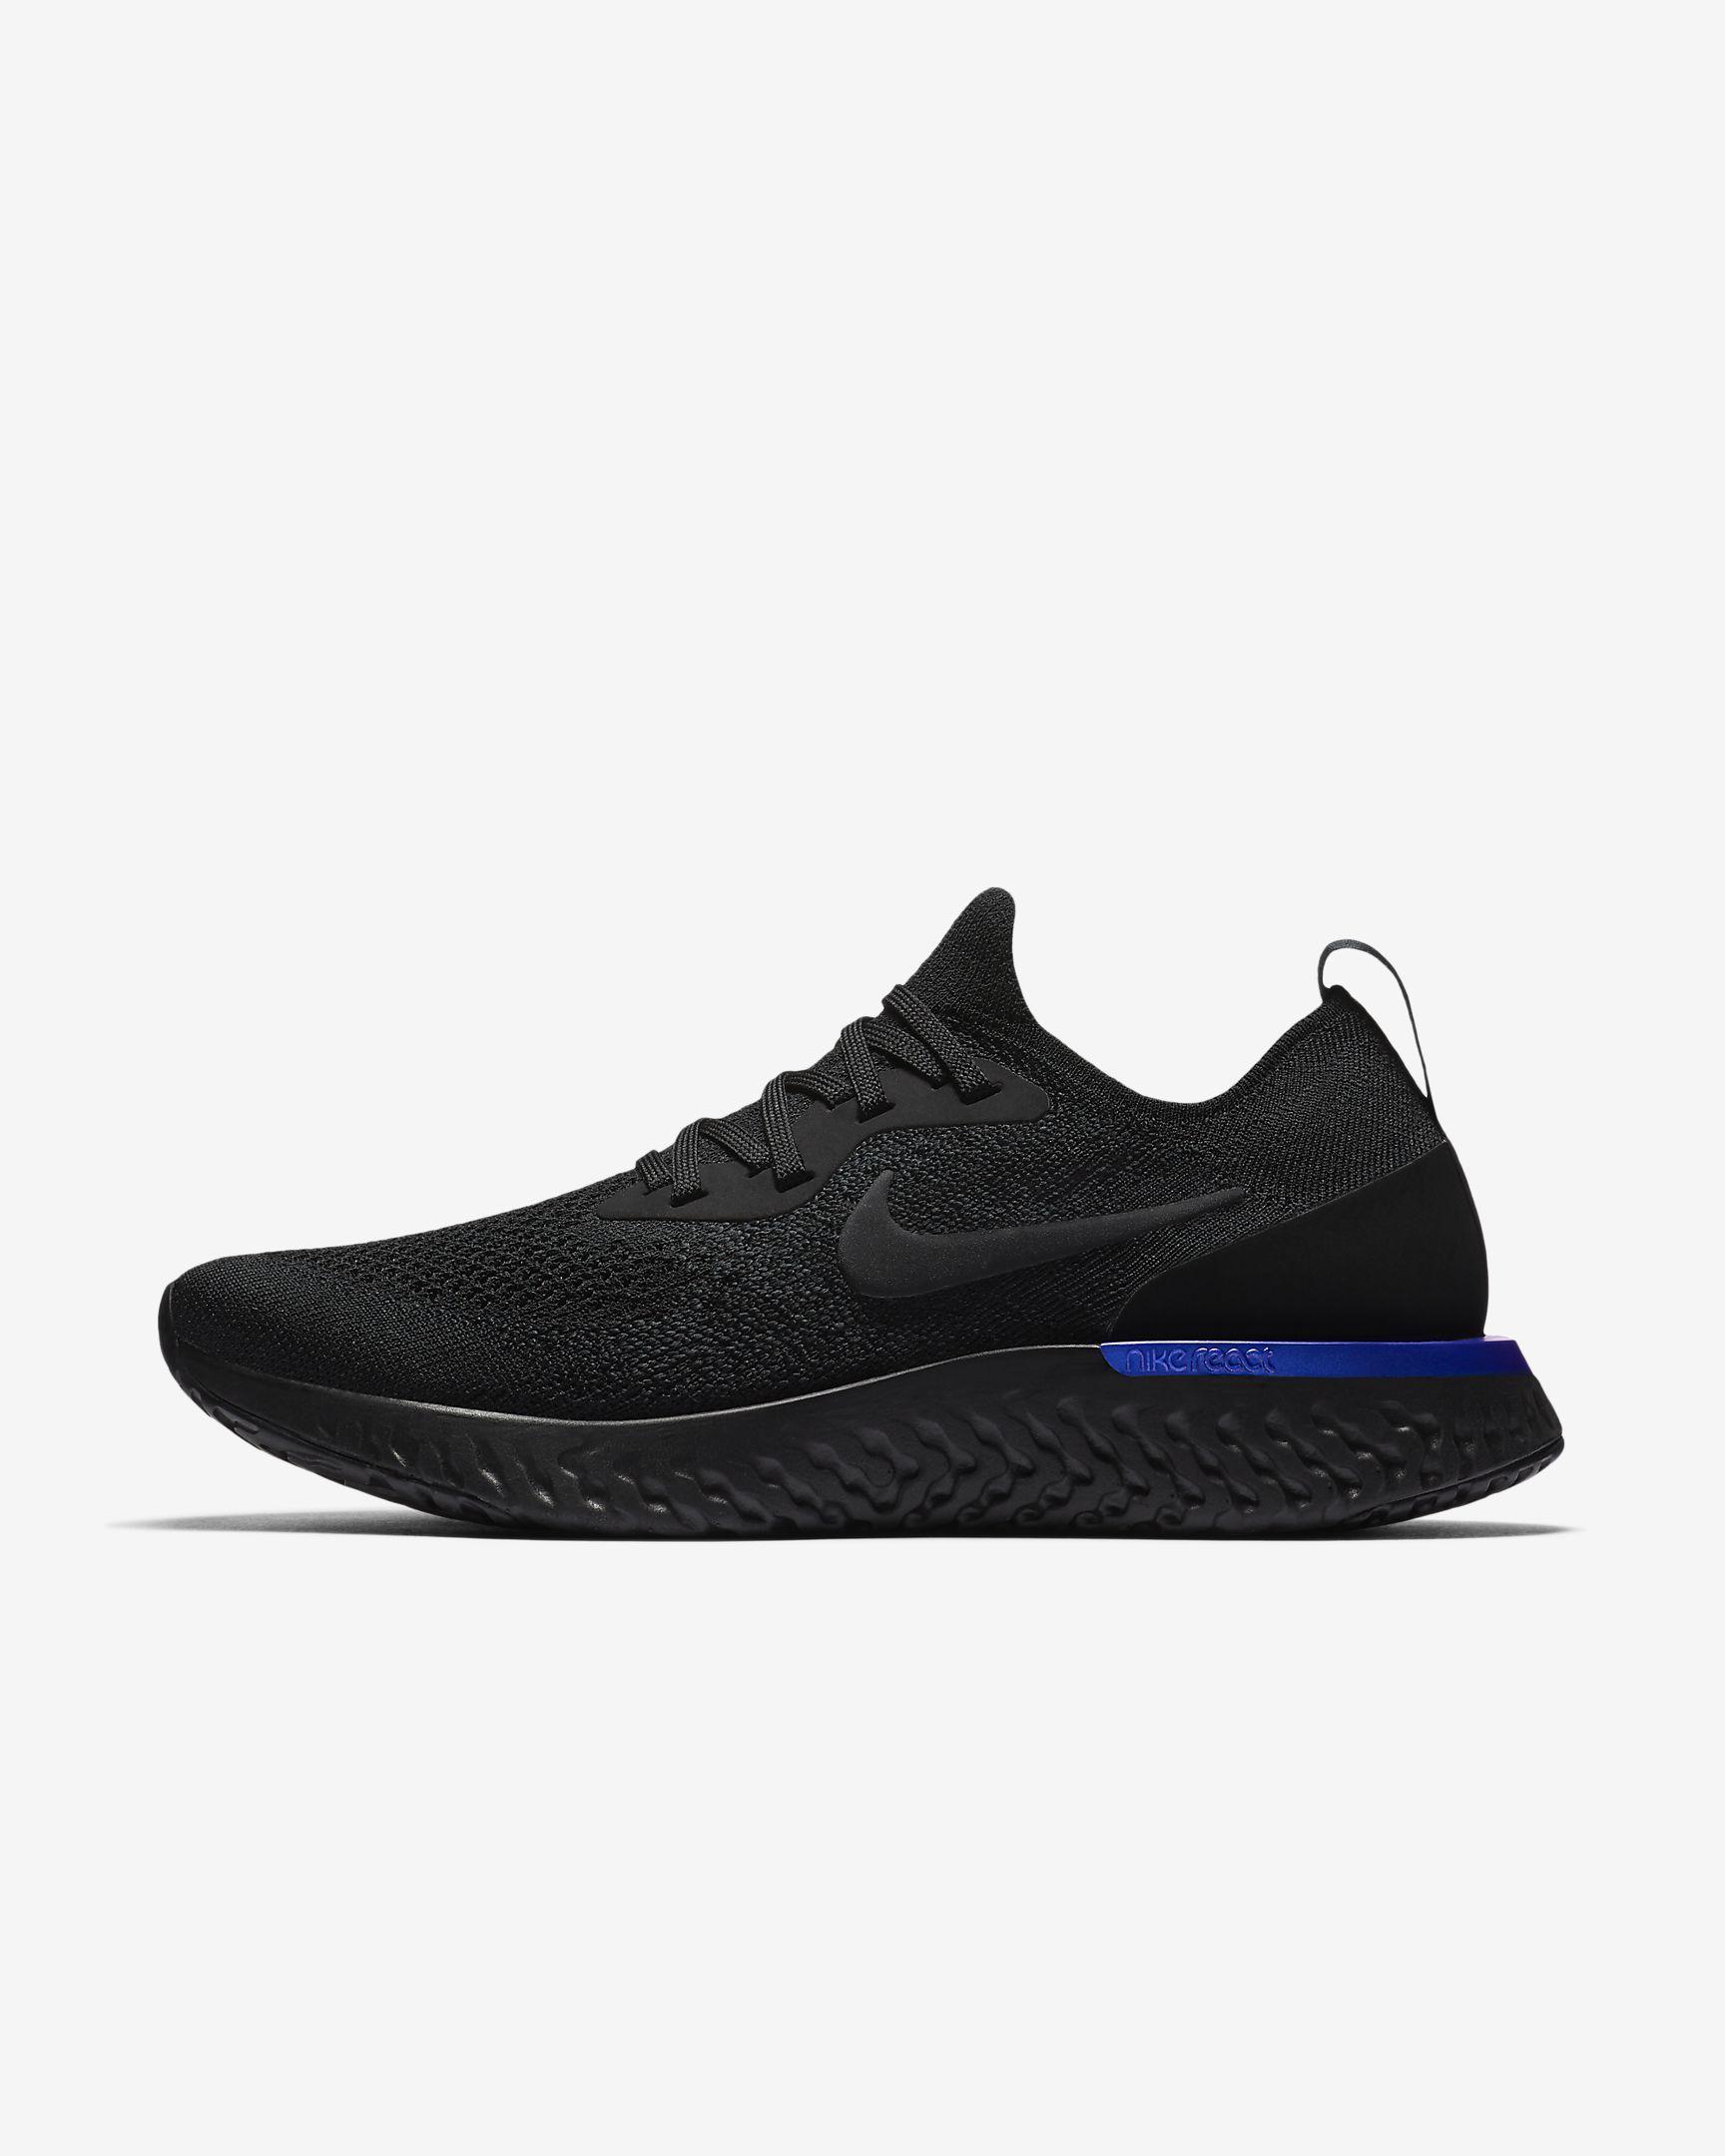 f3443ffa5c28 Nike Epic React Flyknit Zapatillas de running - Mujer